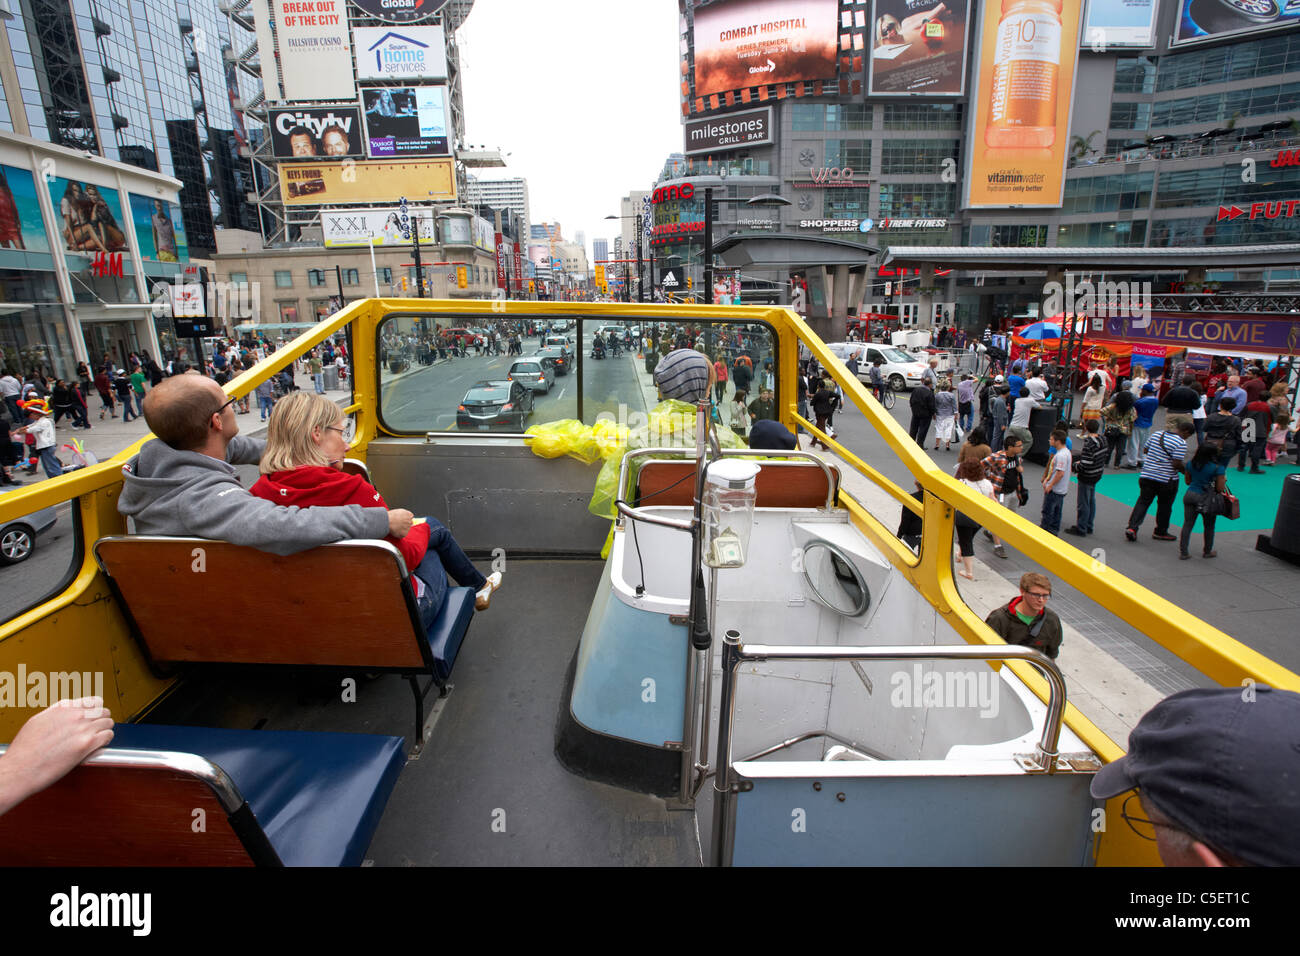 open top guided bus city tour top deck downtown yonge dundas square toronto ontario canada - Stock Image